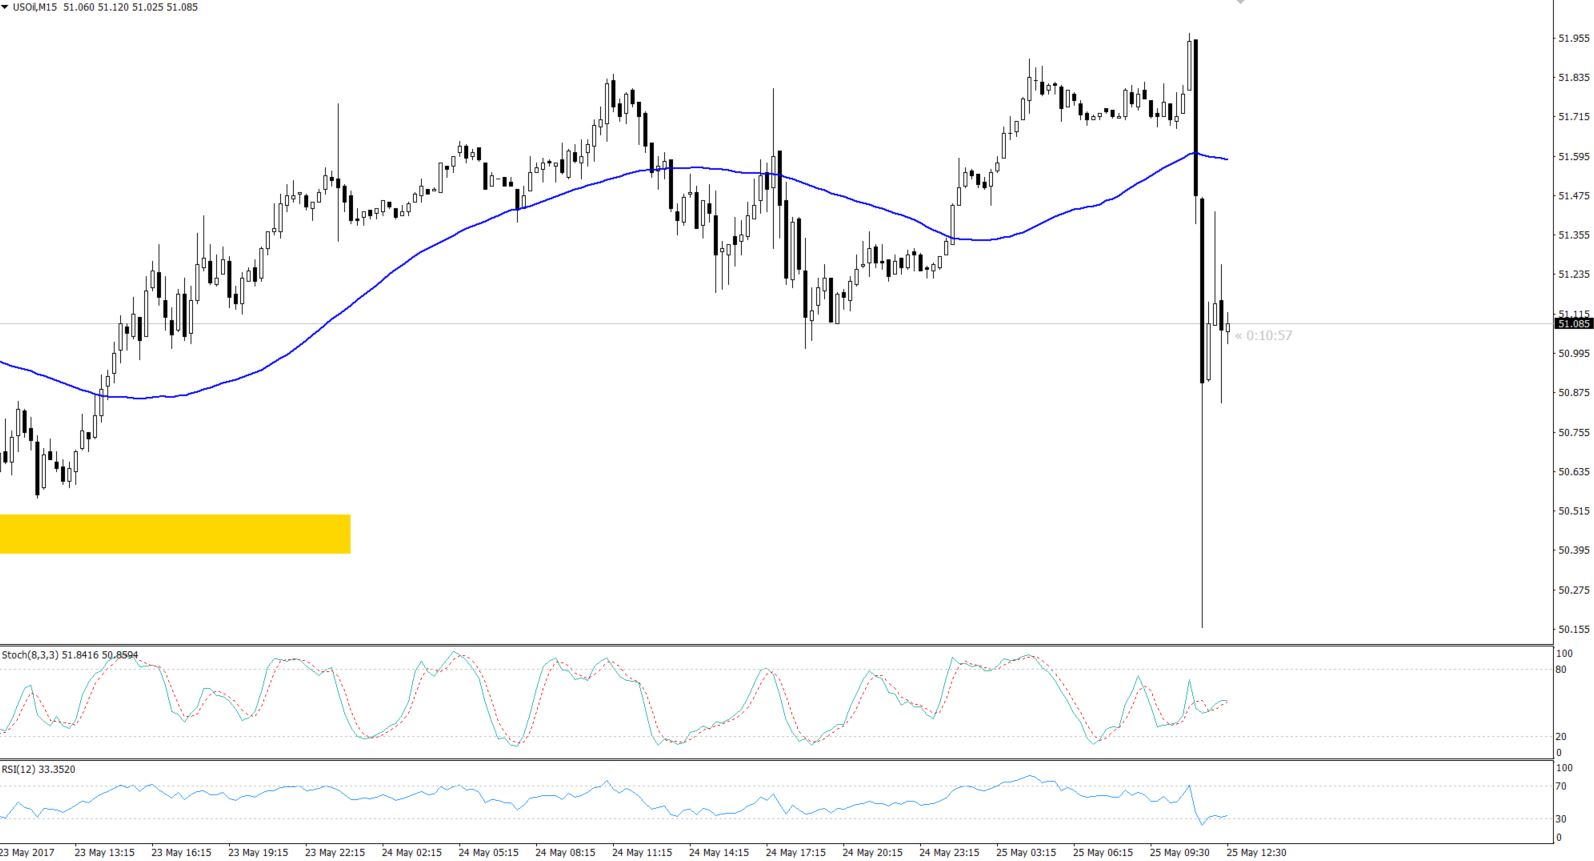 180 Pips dip - WTI Crude Oil 15 Min Chart